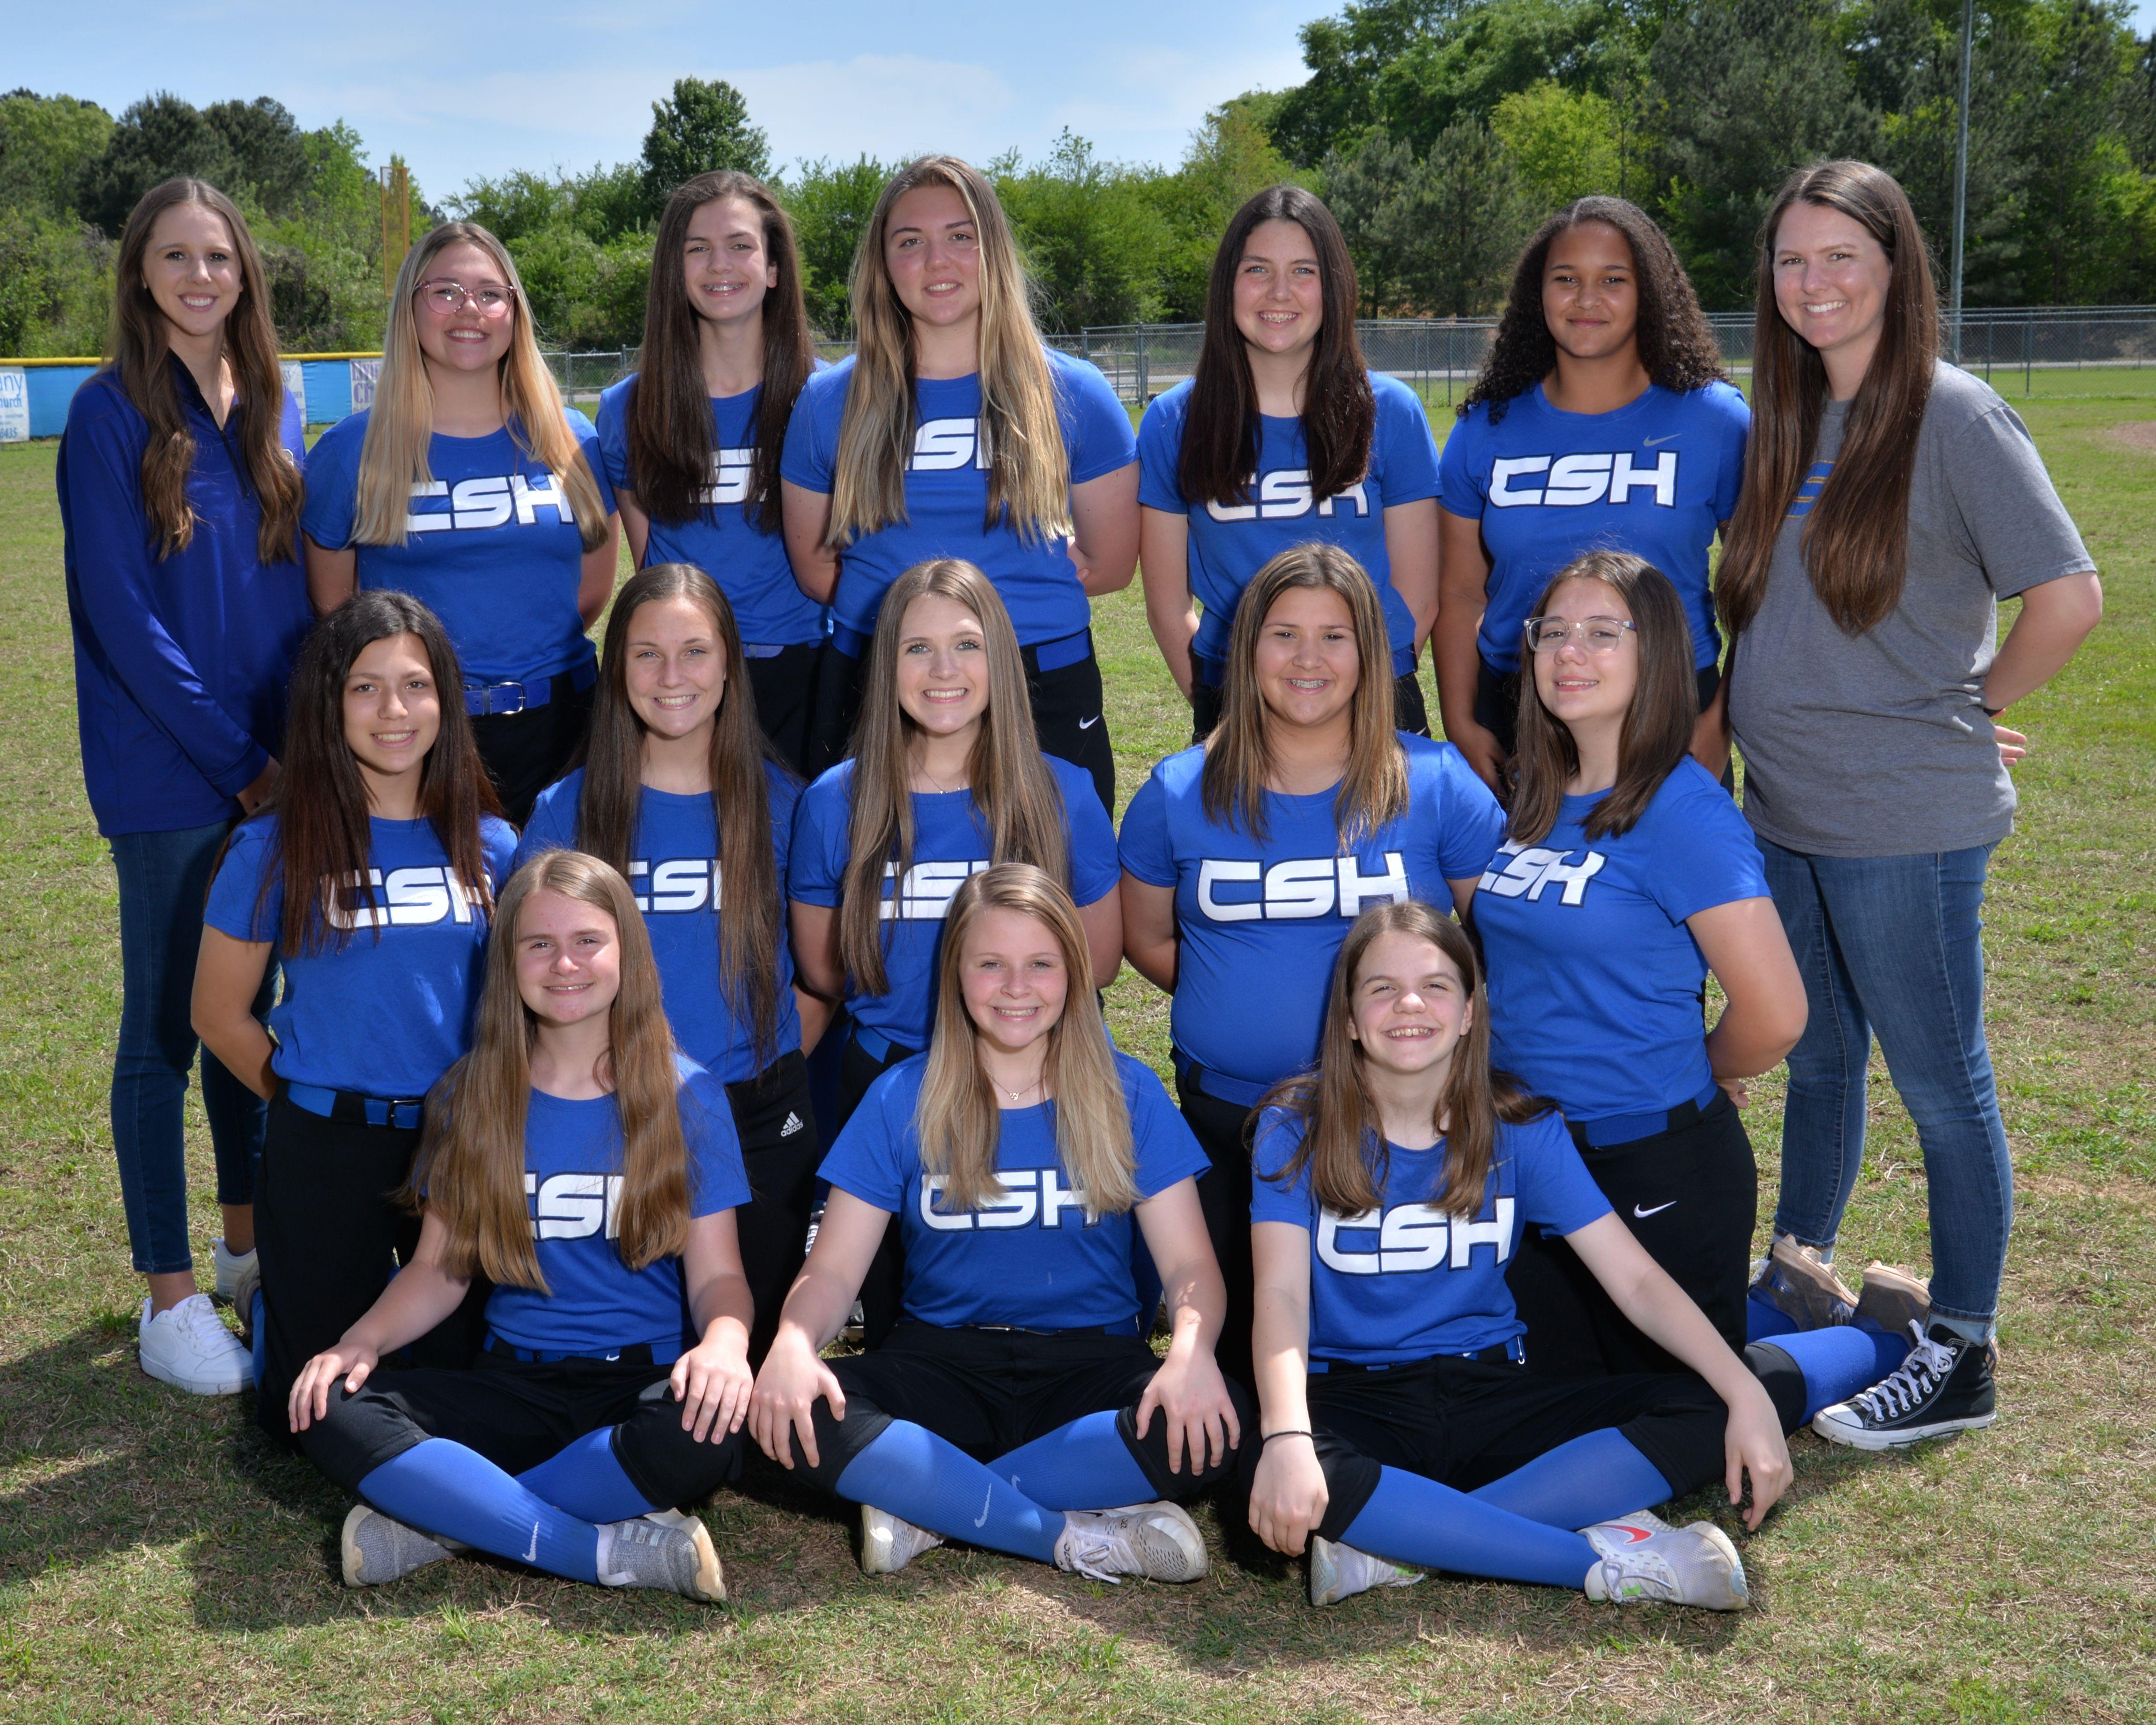 2021 Cold Springs JV Softball Team